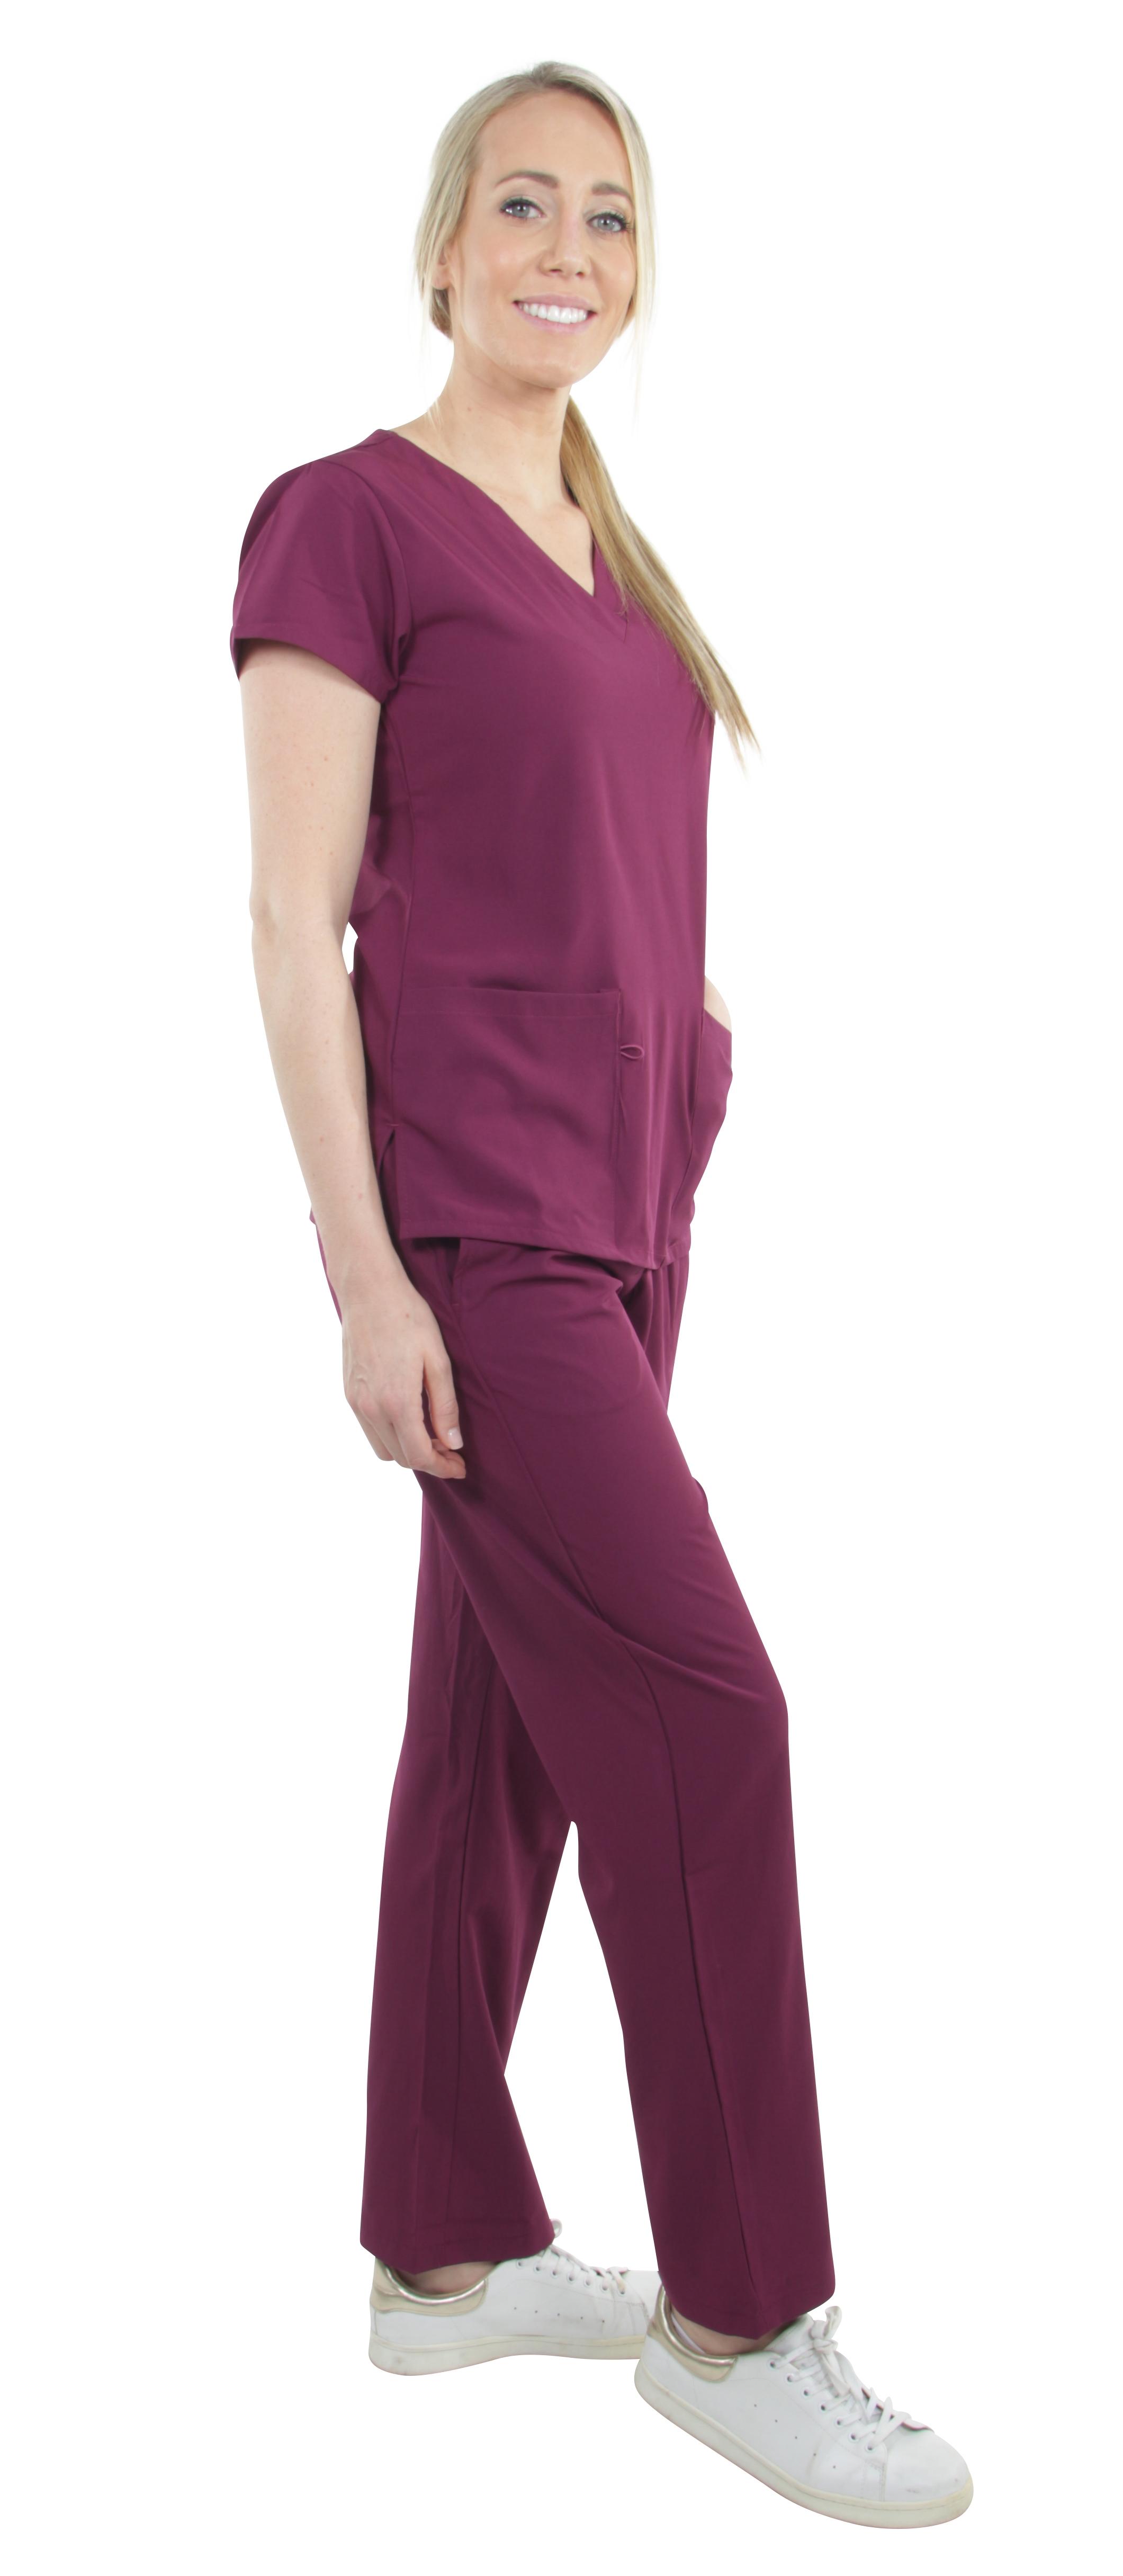 Unisex-Performance-Stretch-Medical-Uniform-Five-Pockets-V-Neck-Scrubs-Sets miniature 10